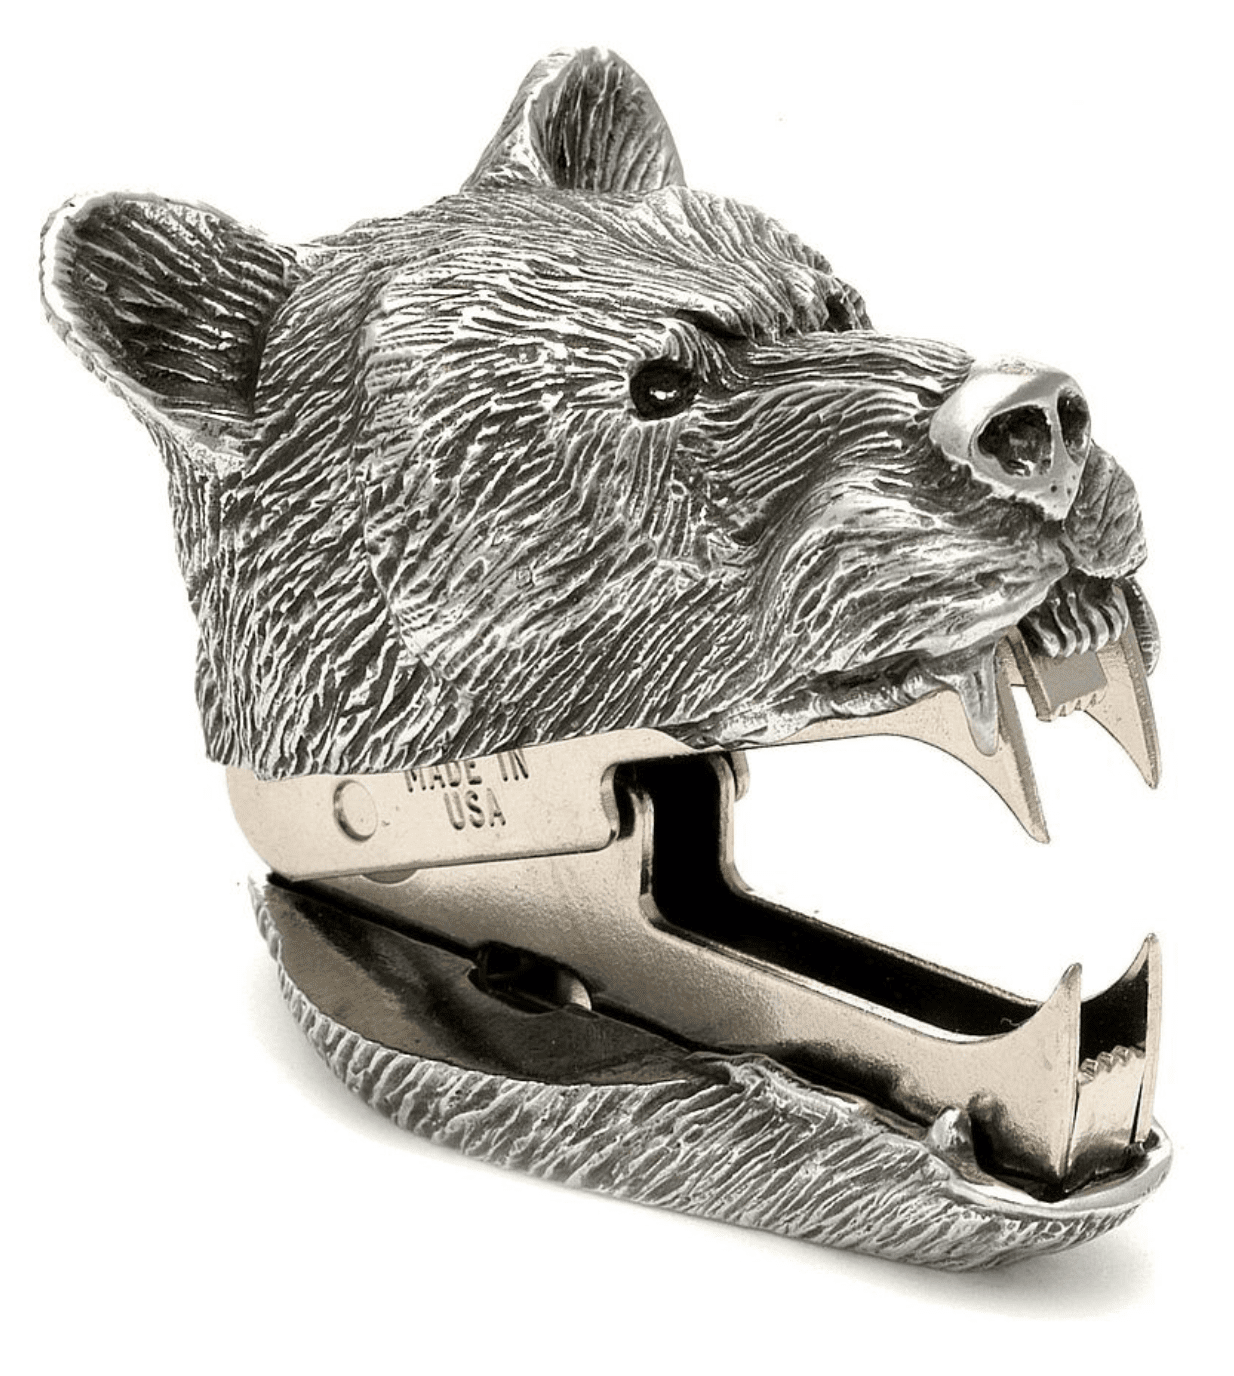 jac-zagoory-designs-bears-growl-remover